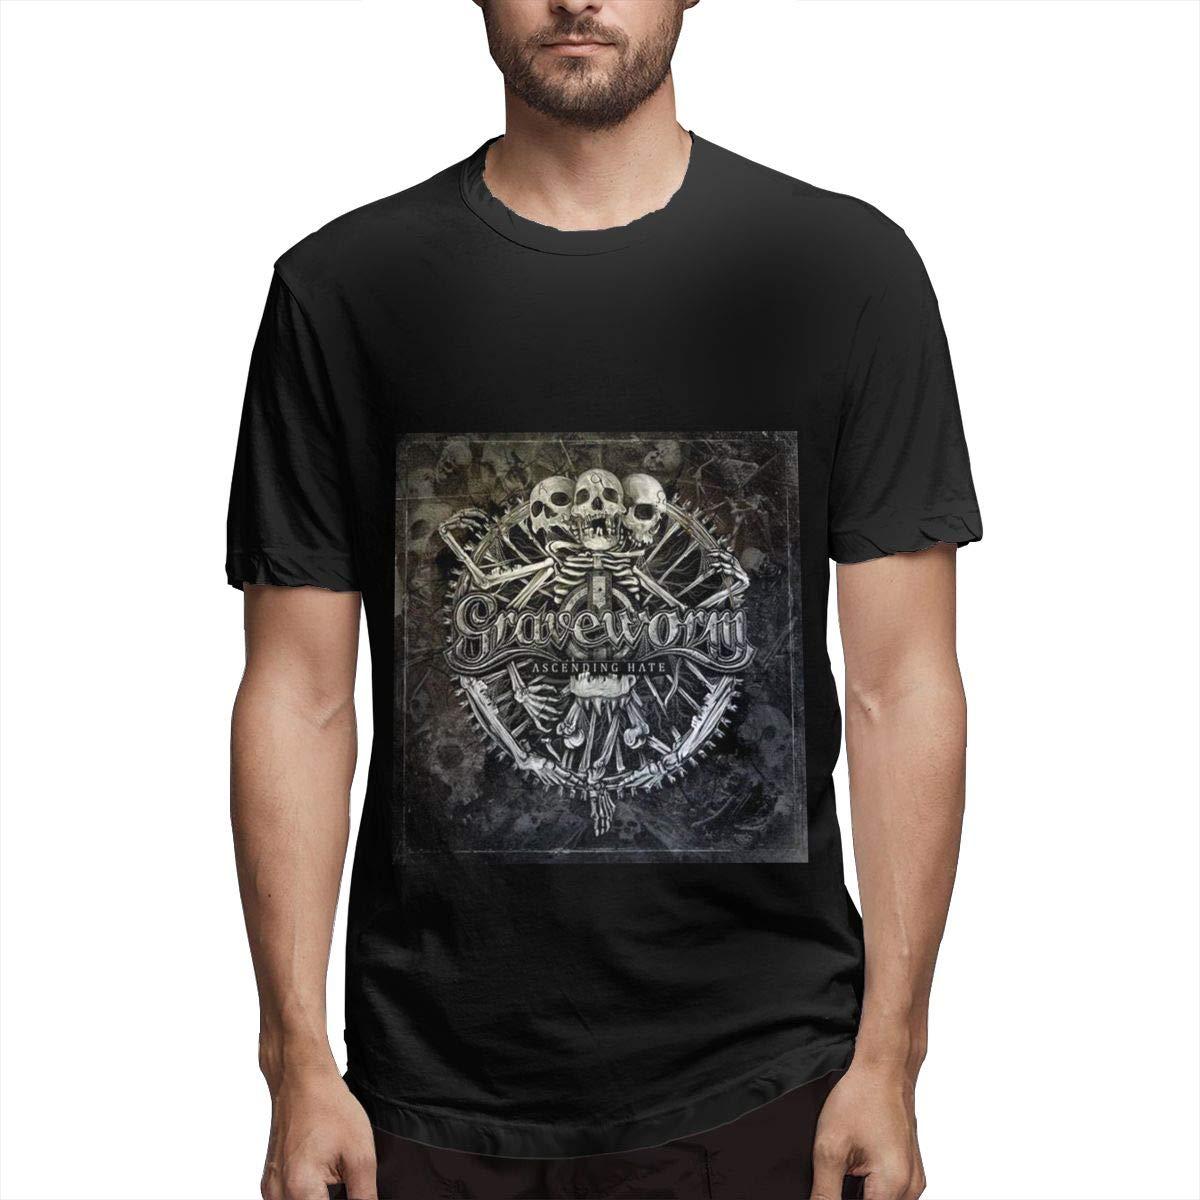 Lihehen Mans Graveworm Simple Casual Round Neck Ts Shirts